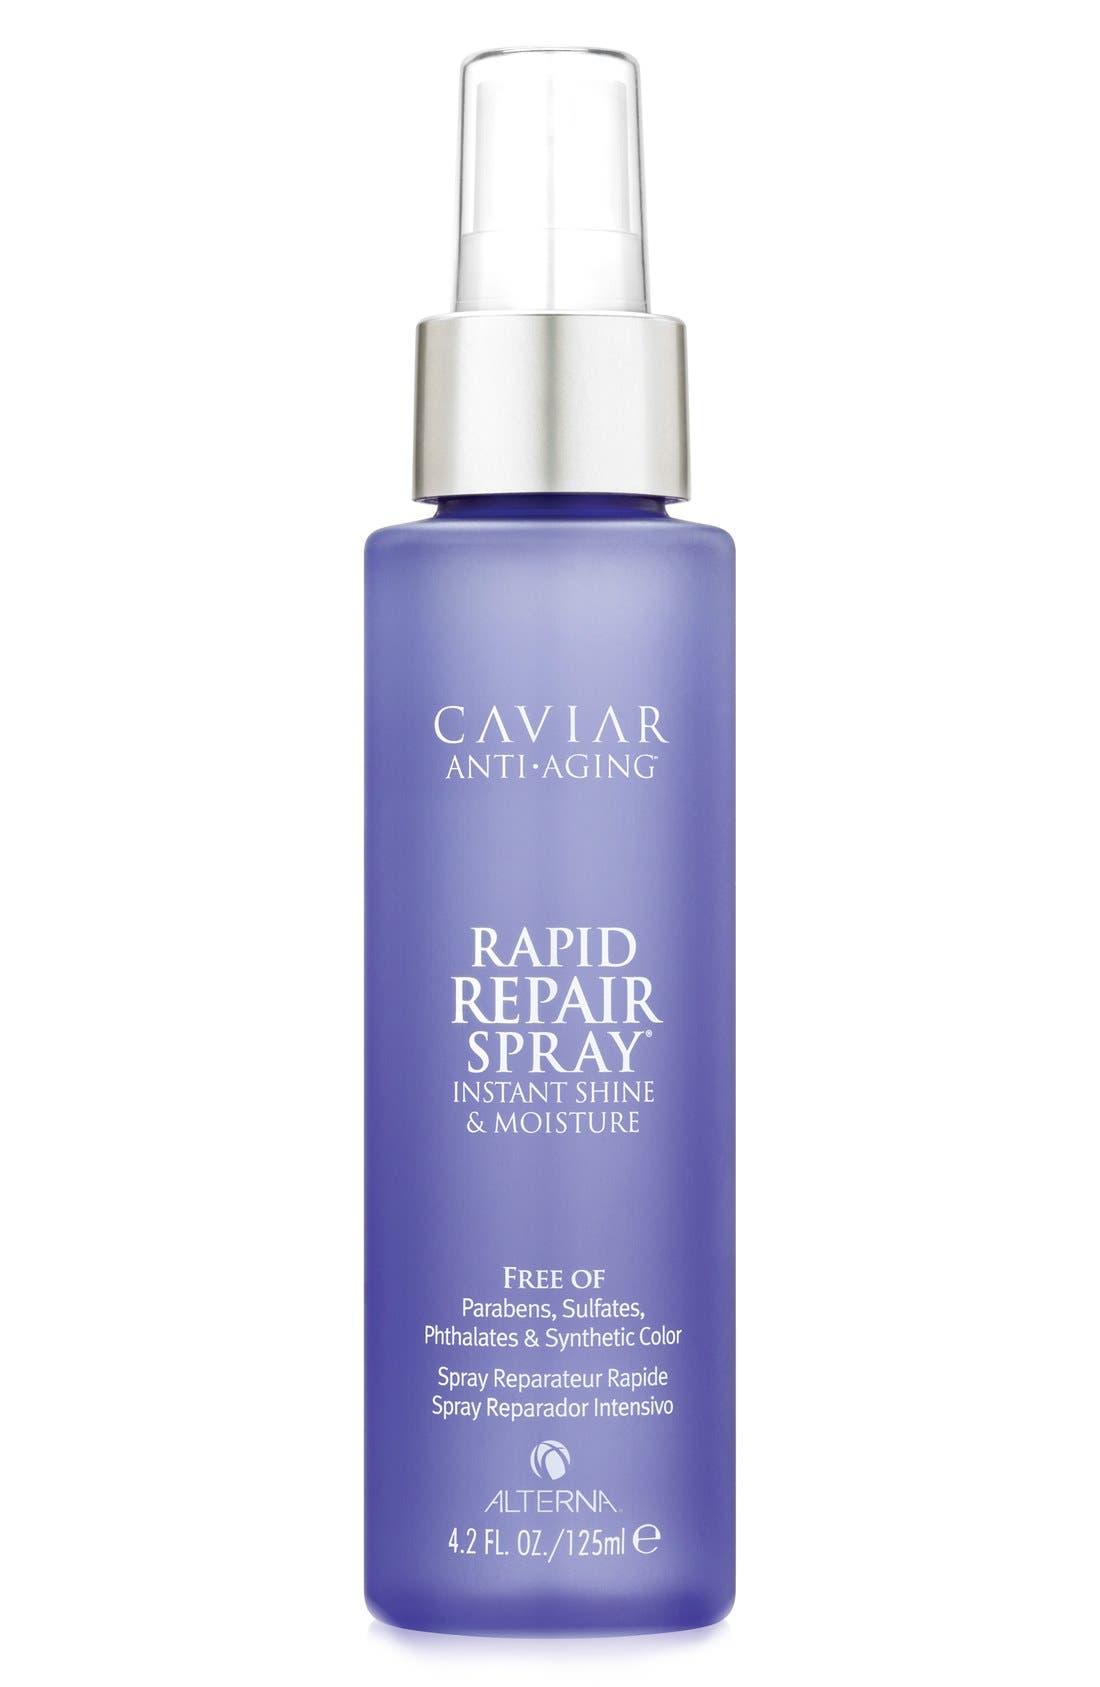 Caviar Anti-Aging Rapid Repair Spray,                             Main thumbnail 1, color,                             000